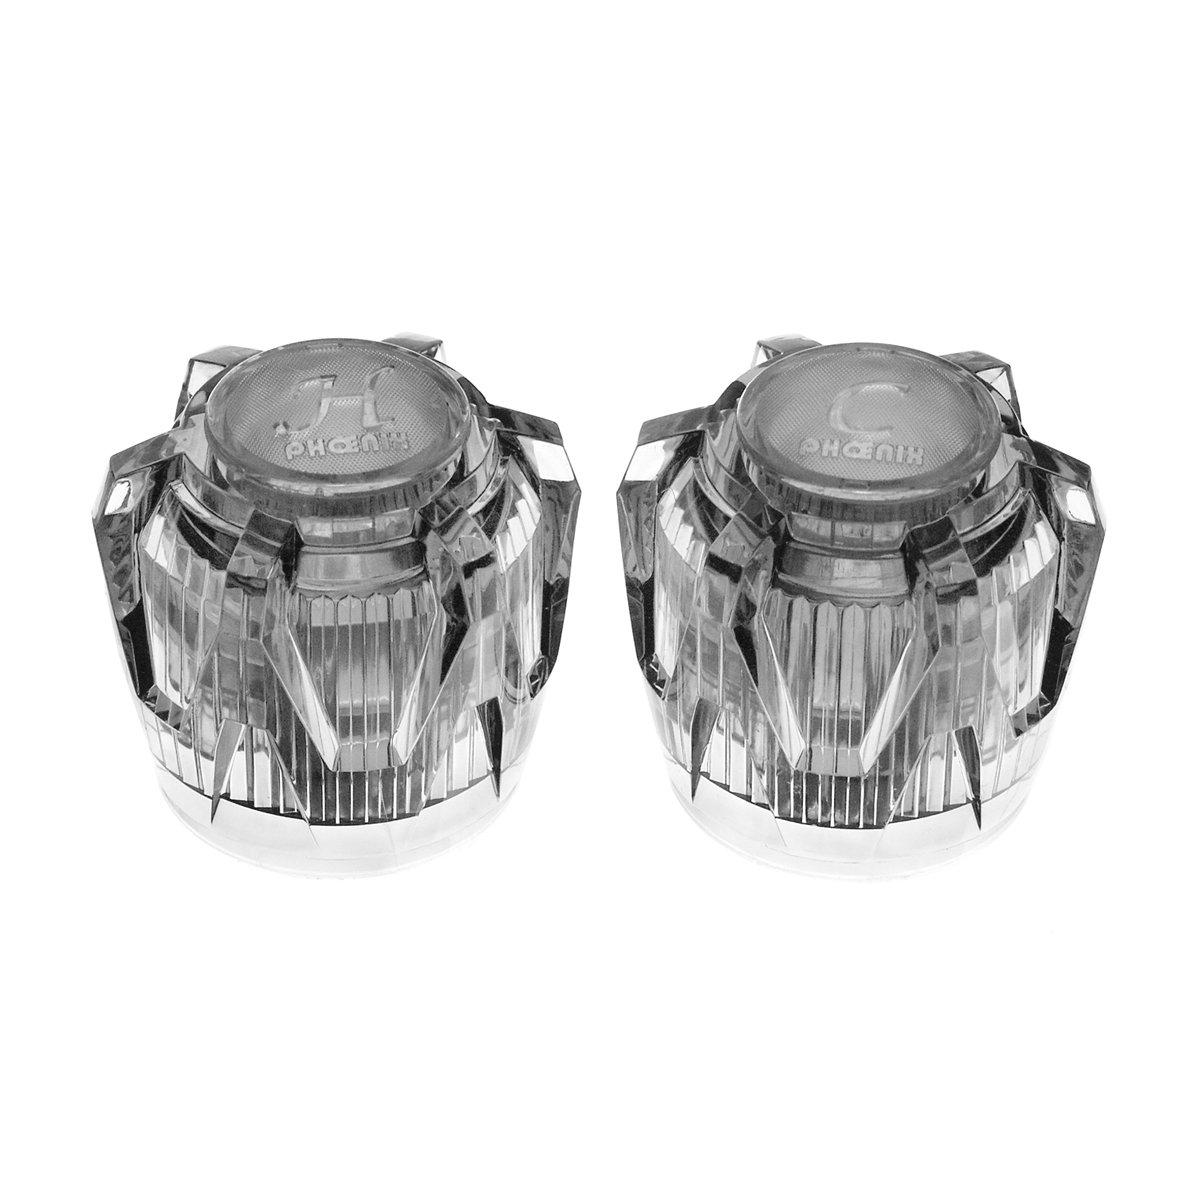 Danco 88239X Faucet Handles for Phoenix, Smoke